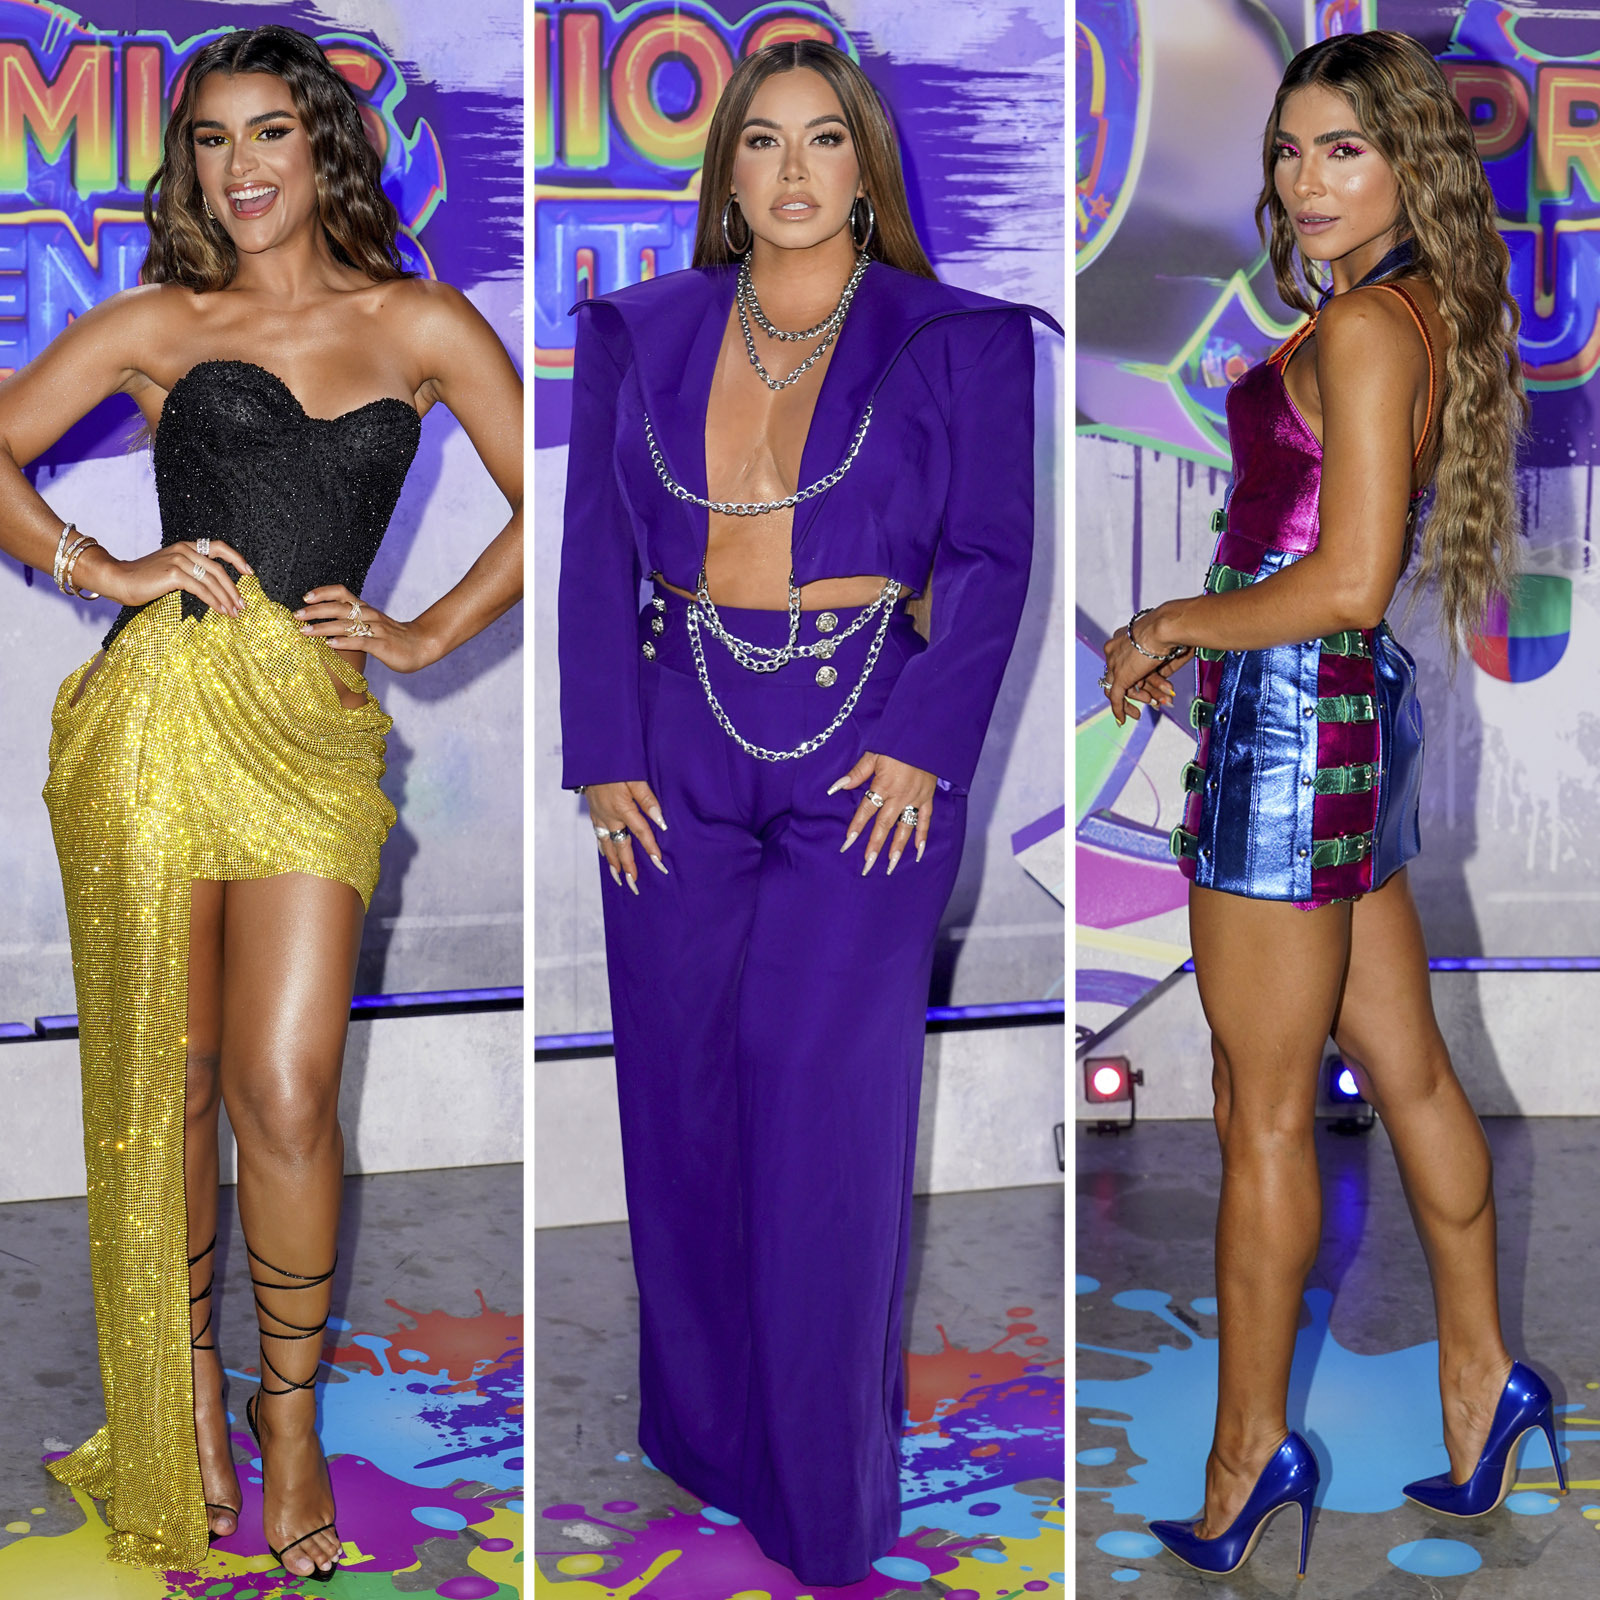 Alejandra Espinoza, Chiquis Rivera, Clarissa Molina, premios juventud